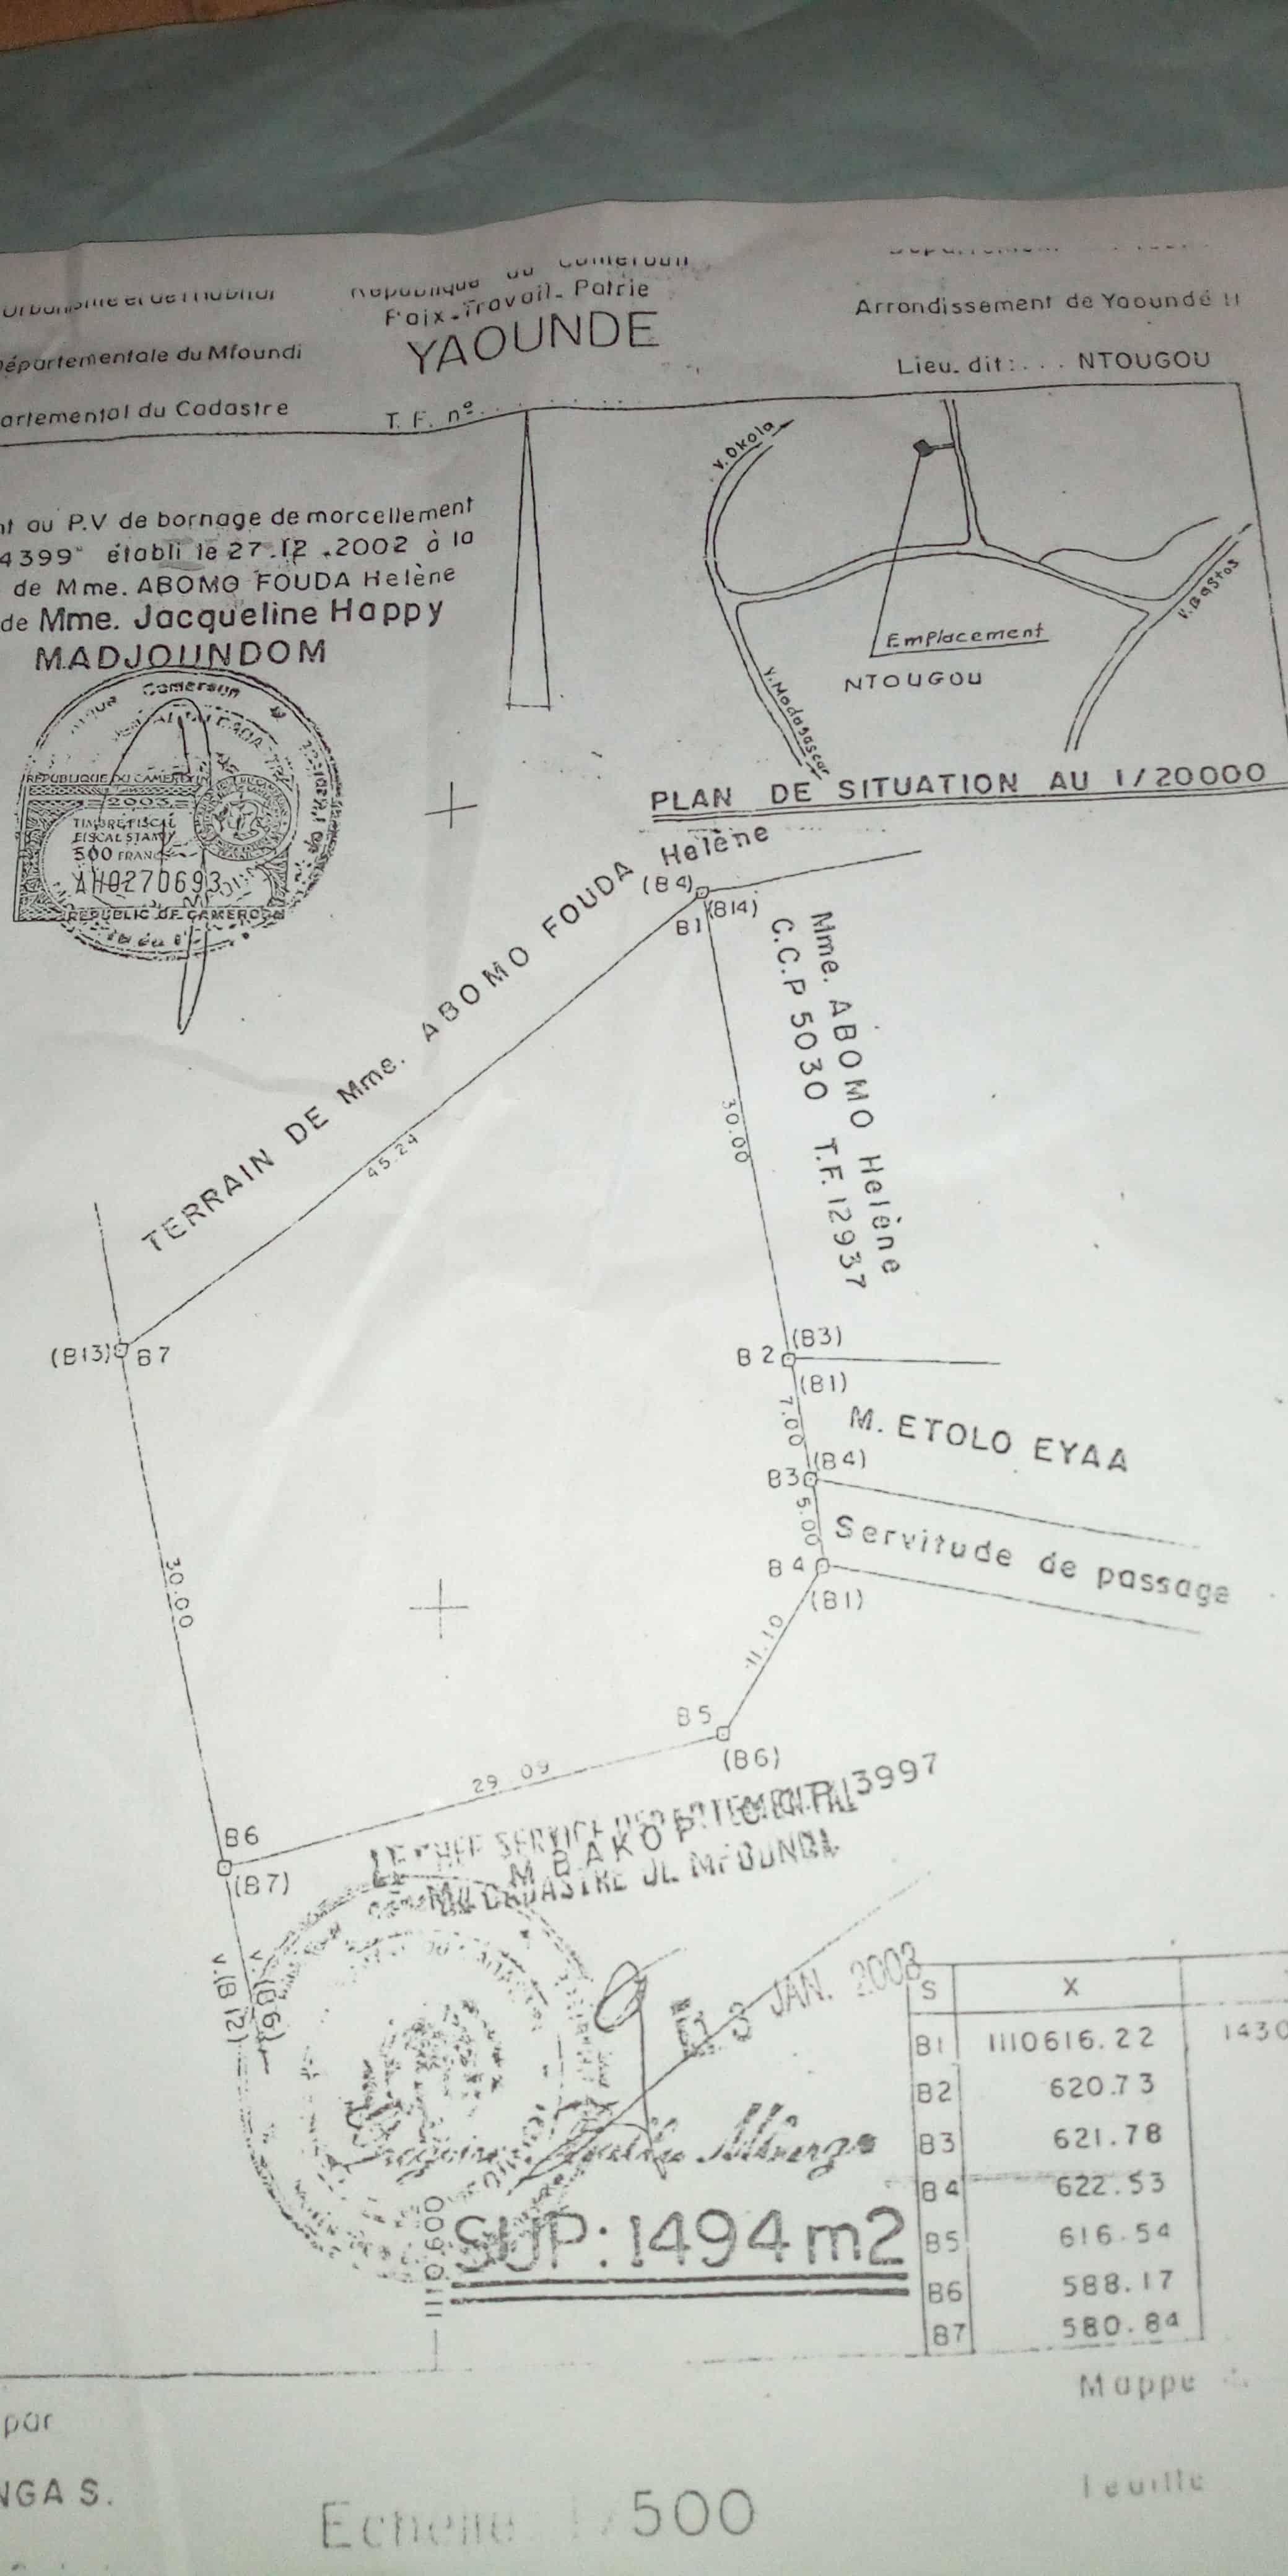 Land for sale at Yaoundé, Bastos, Terrain à vendre Yaoundé golf febe - 1400 m2 - 630 000 000 FCFA